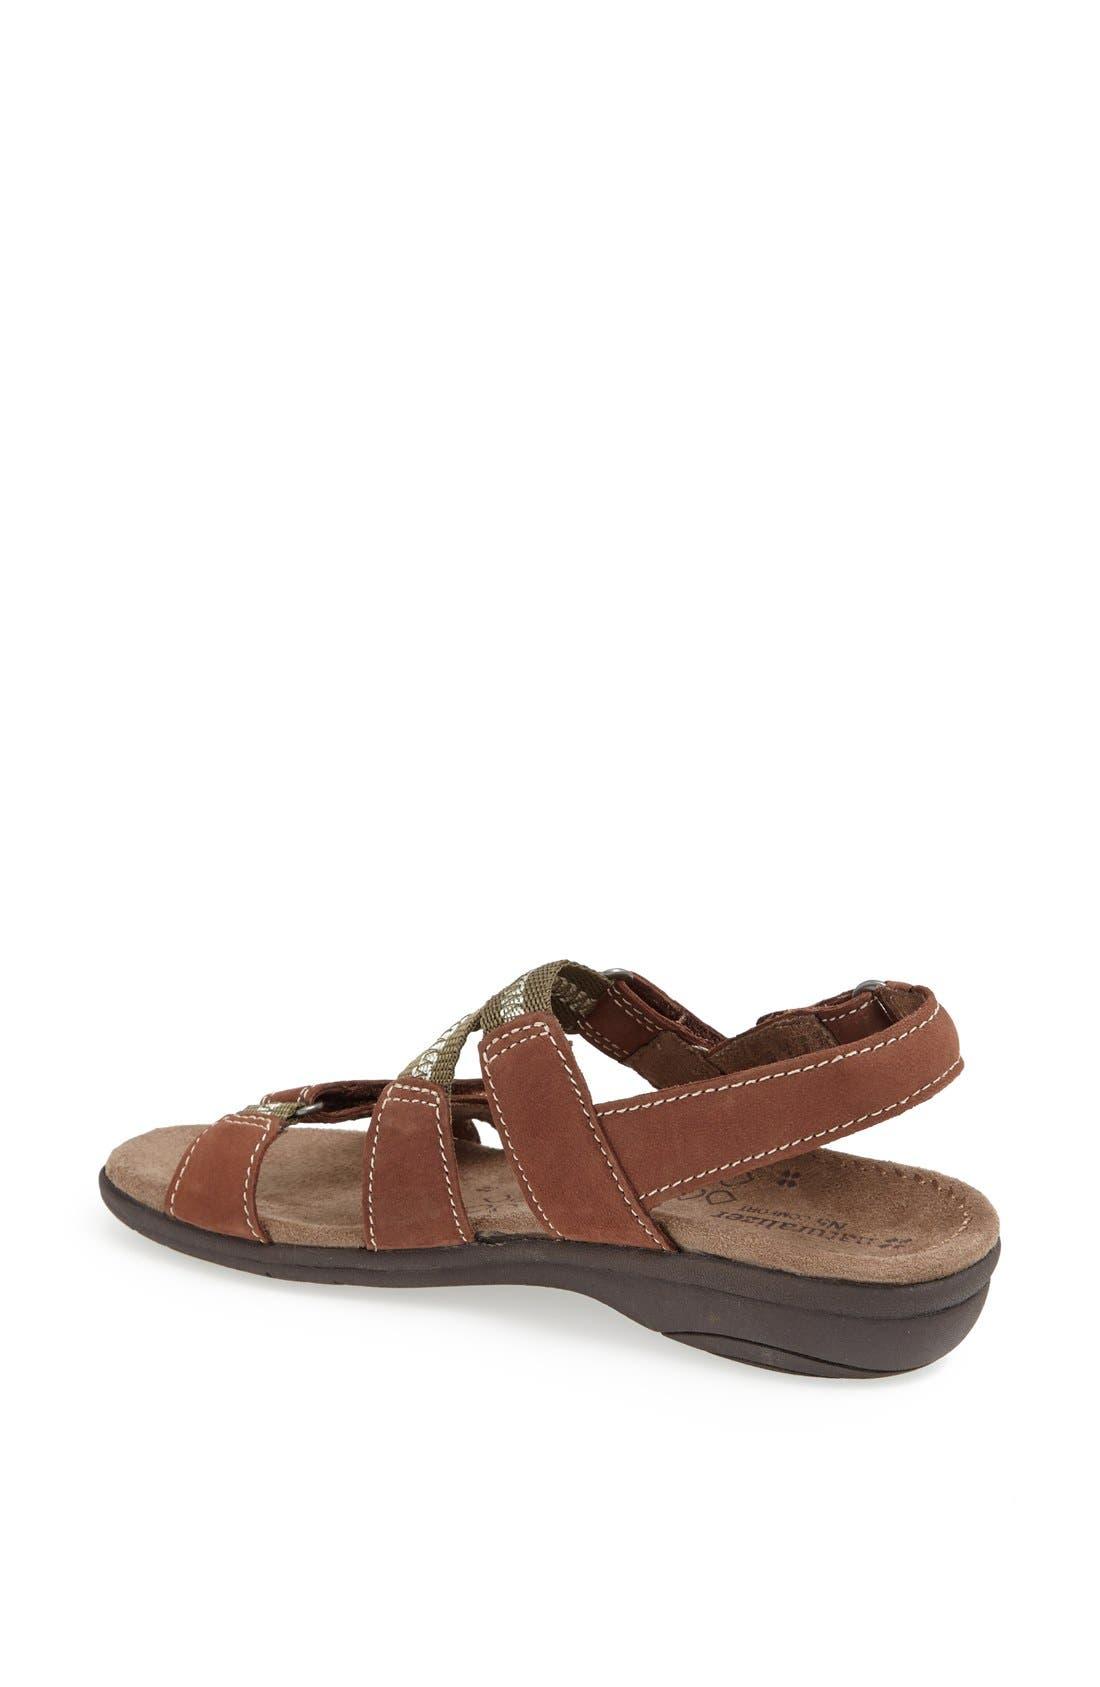 Alternate Image 2  - Naturalizer 'Valero' Sandal